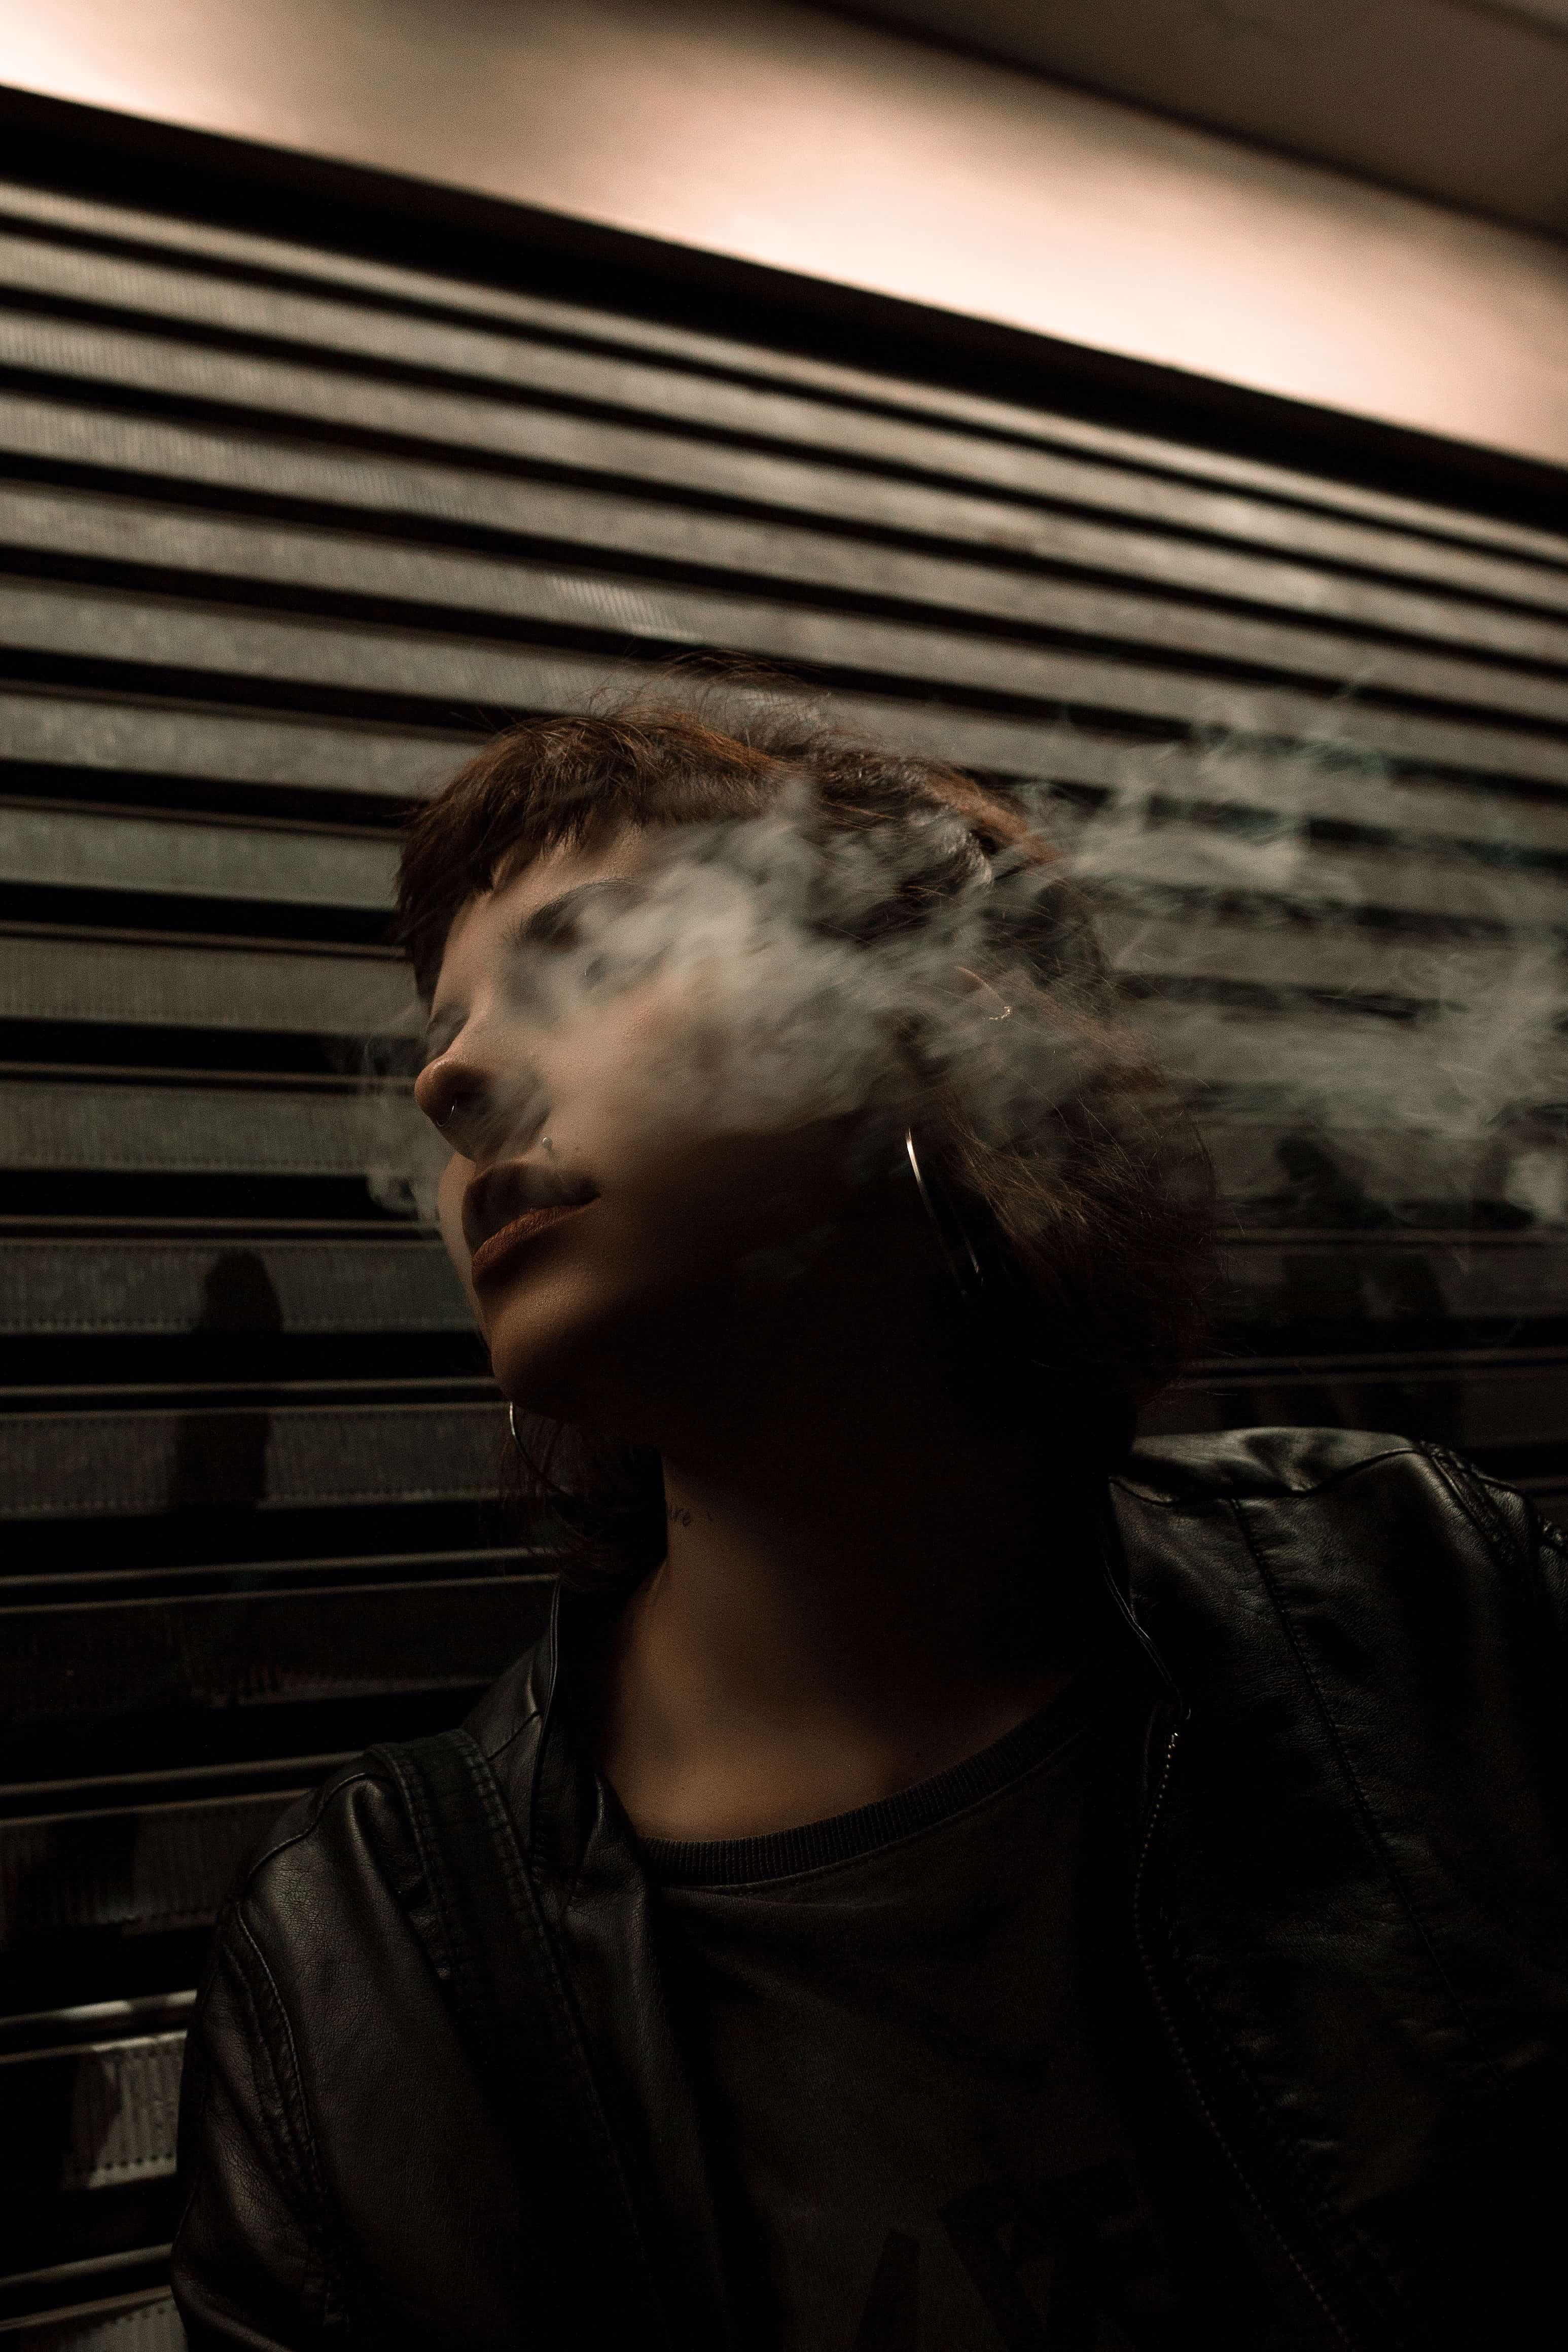 Frau Modelt mit Dampf